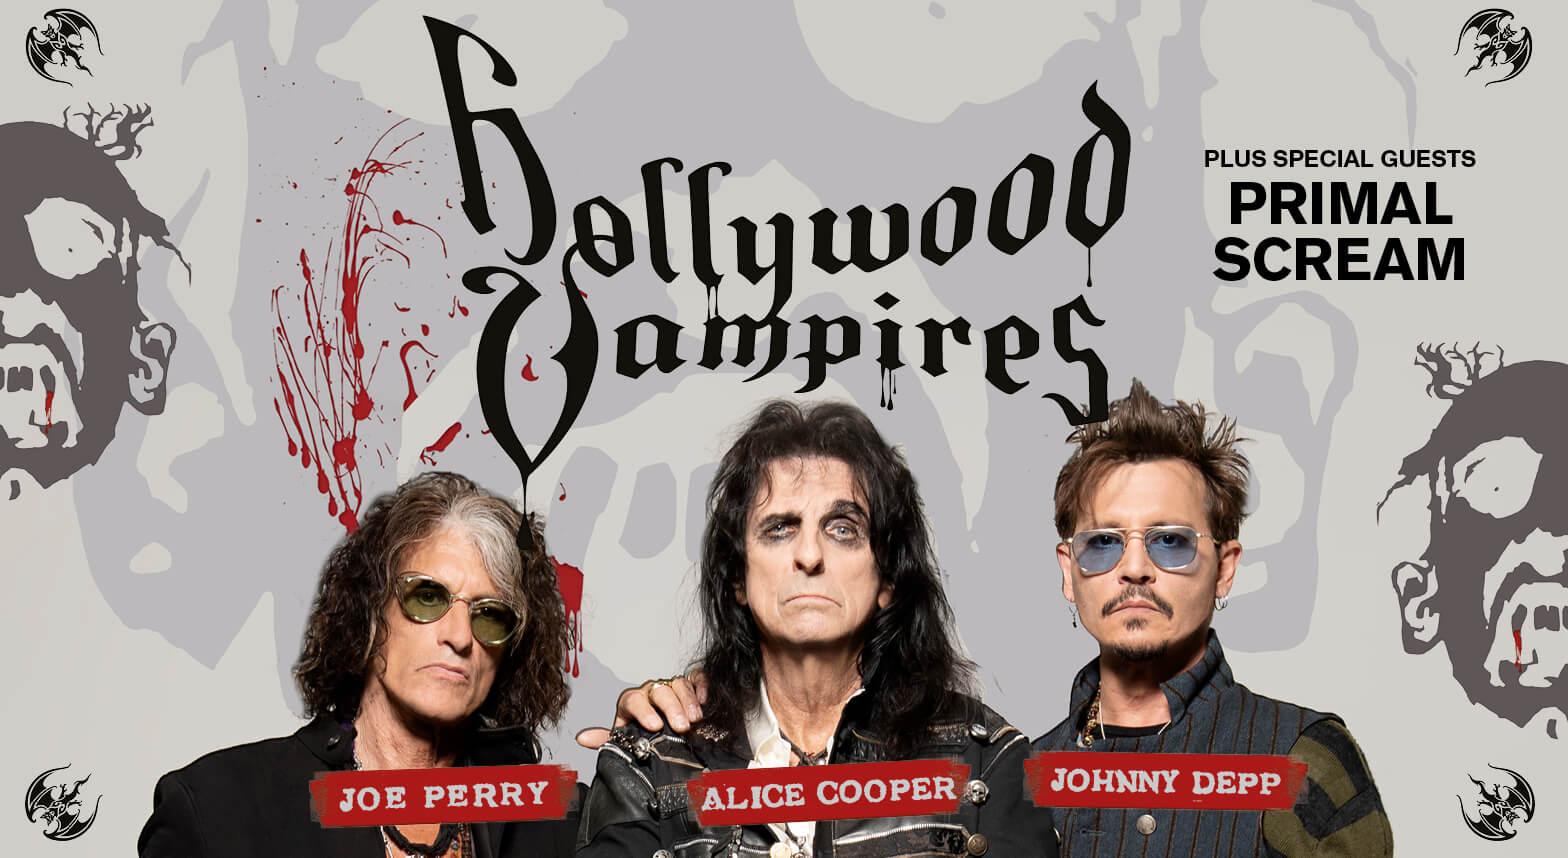 hollywood-vampires-arenas.jpg